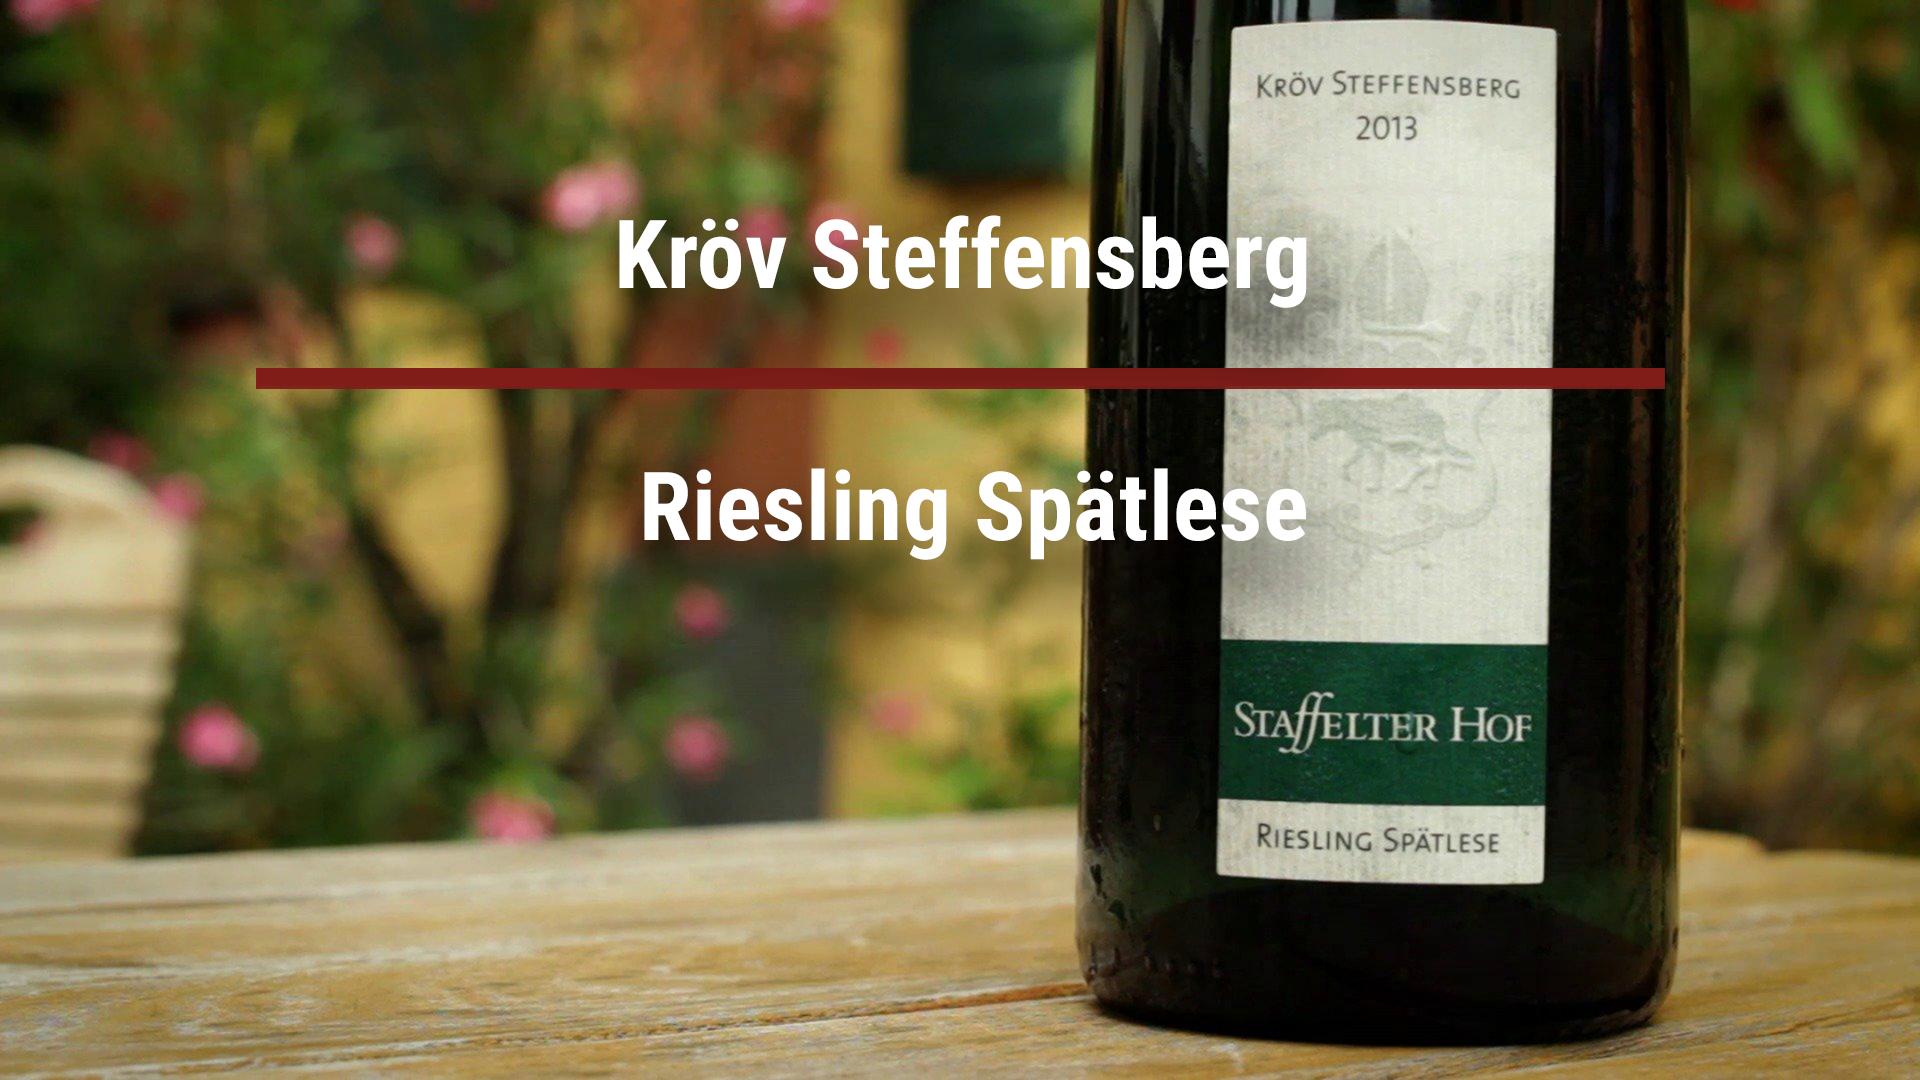 Kröv Steffensberg Riesling Spätlese